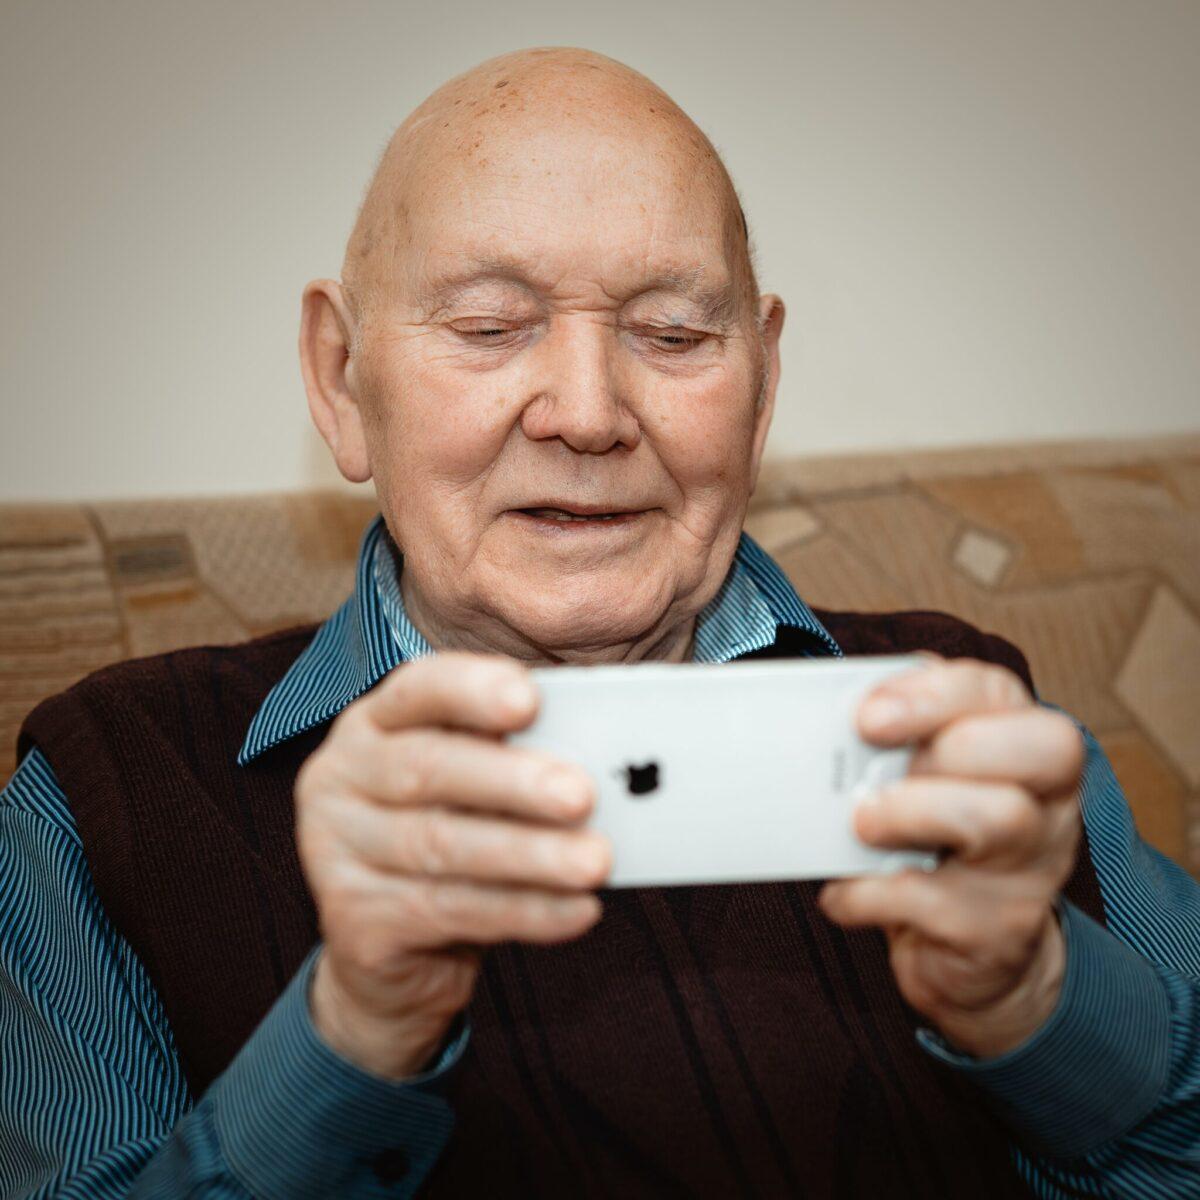 Senior-Citizen-Using-Mobile-Phone